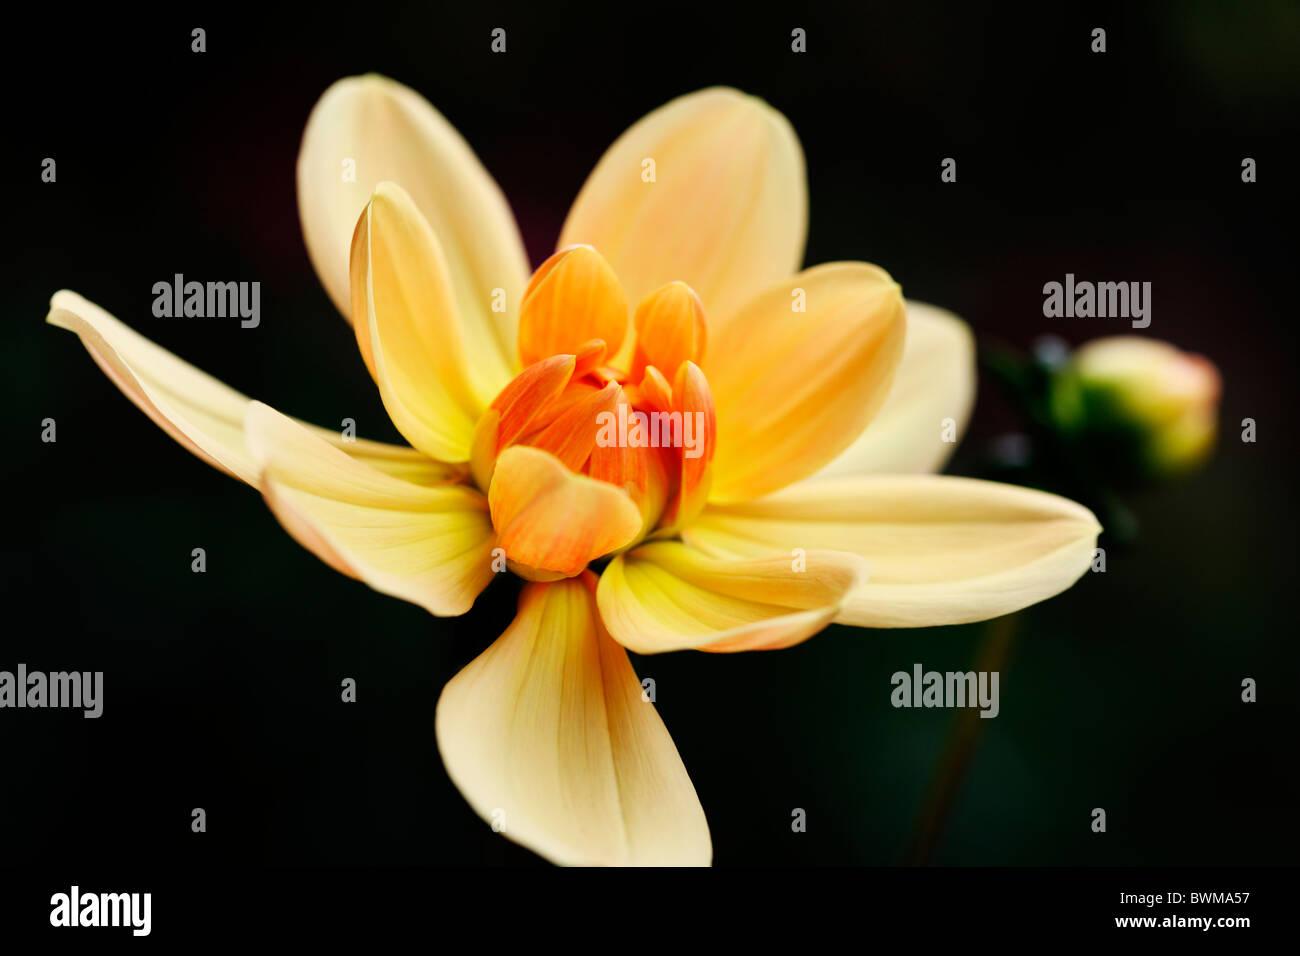 schöne orange Dahlia und Knospe Jane Ann Butler Fotografie JABP922 Stockbild